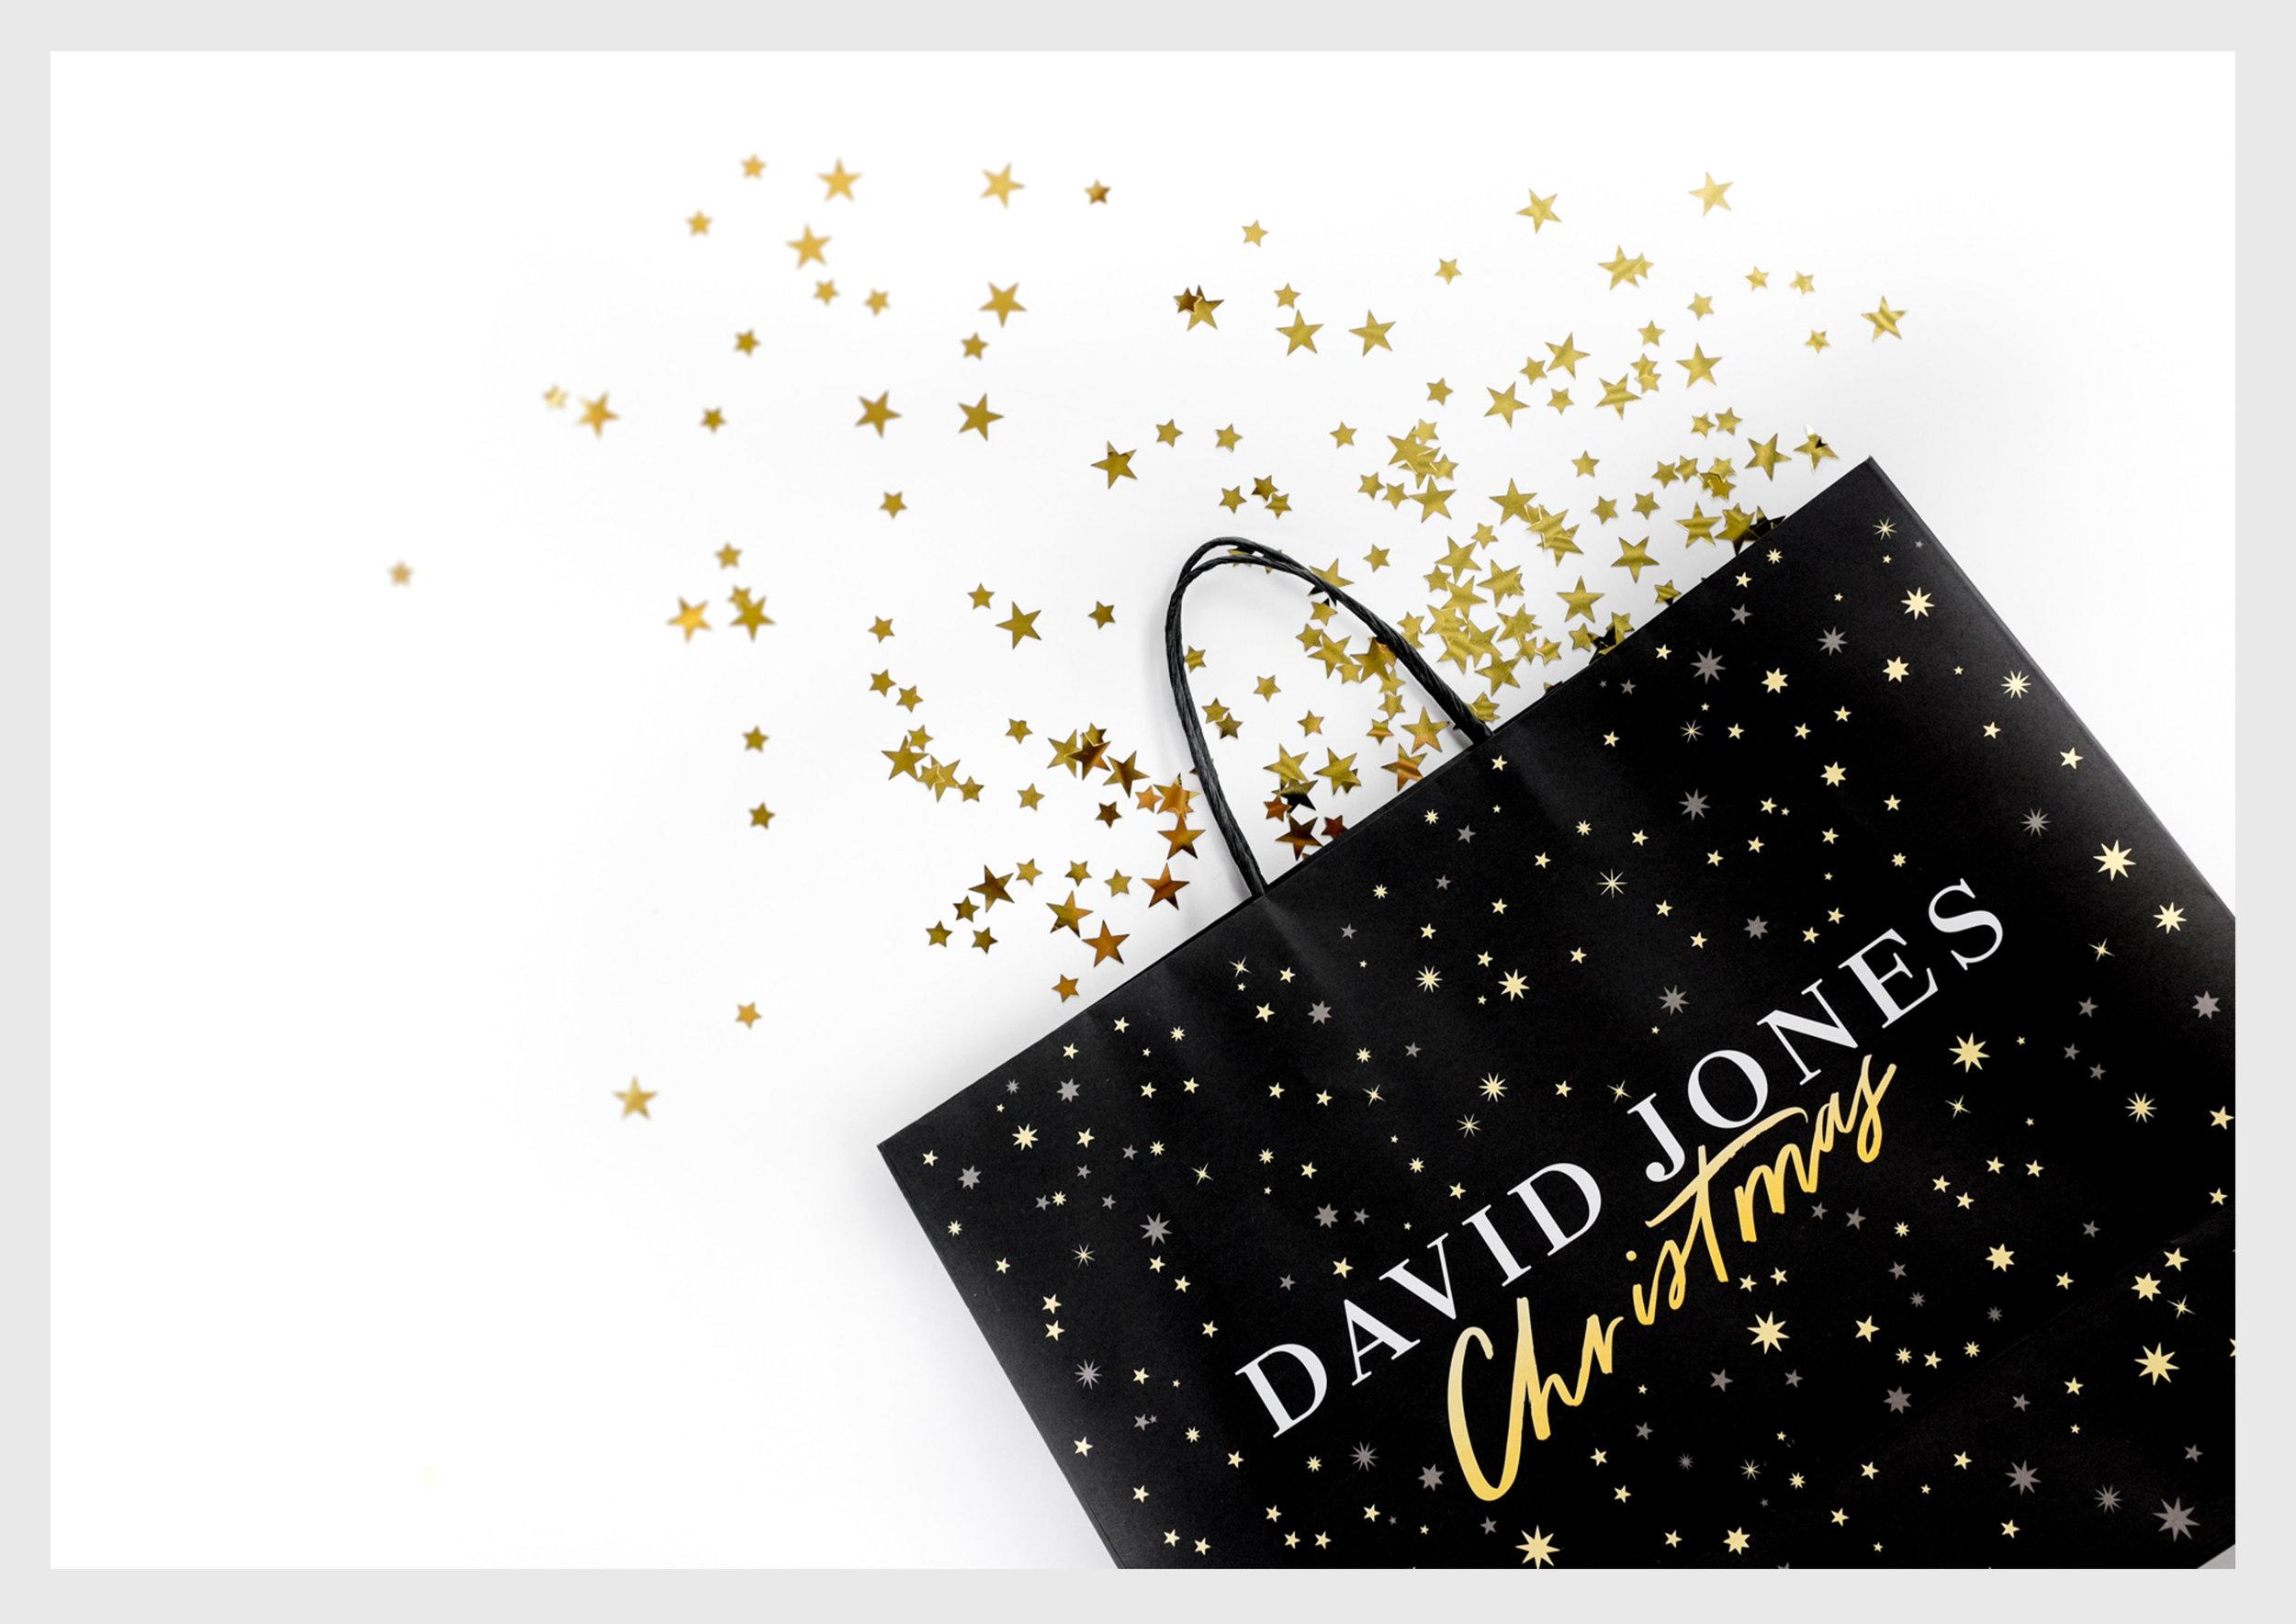 David Jones Christmas Shopping Bags 2016